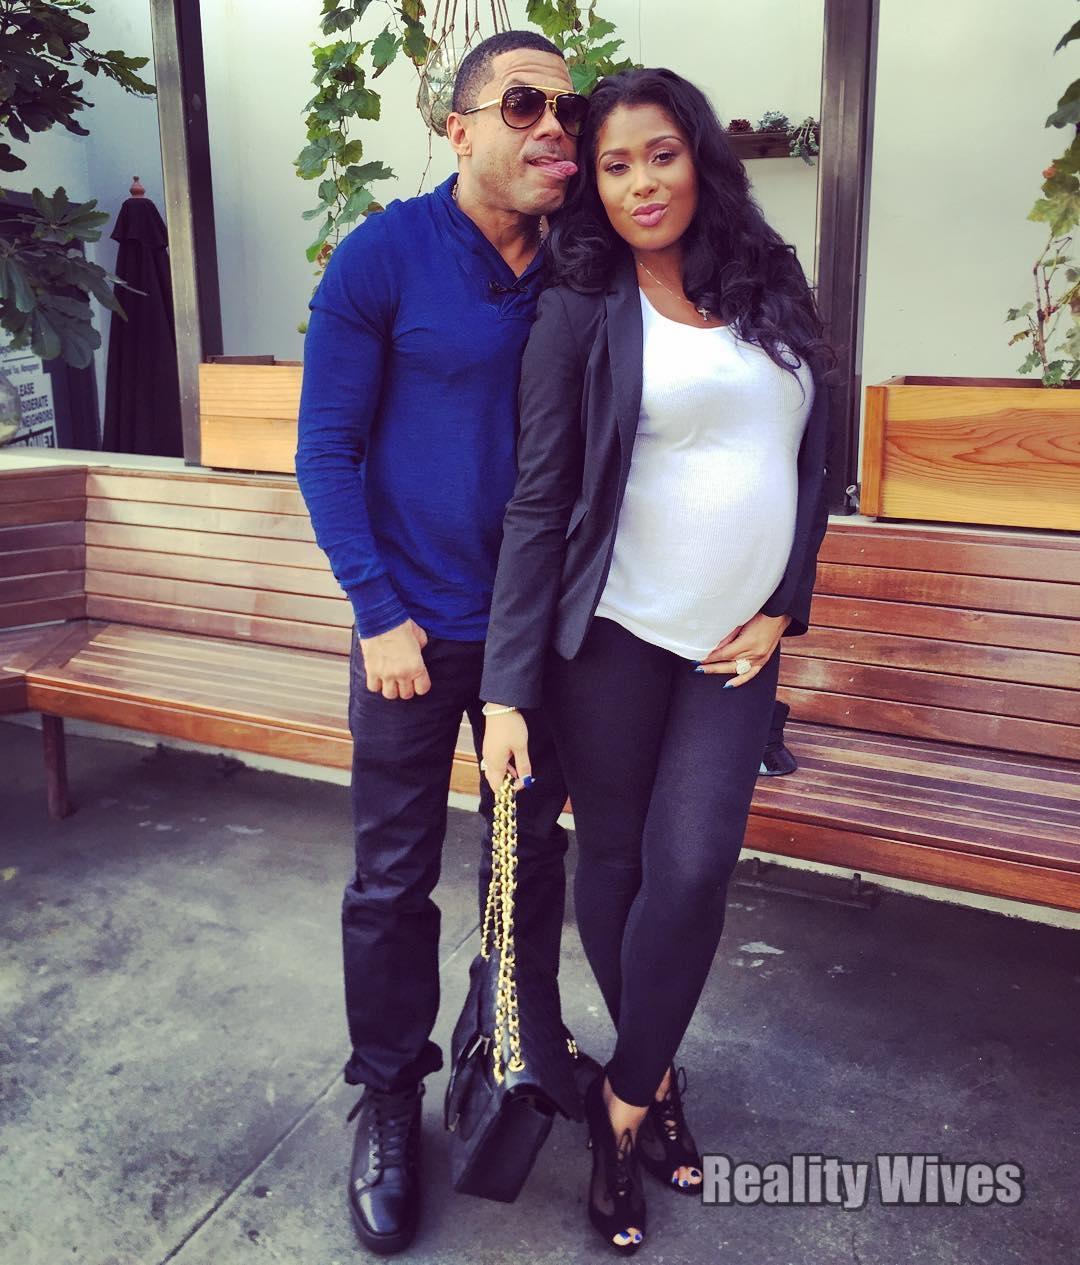 [PHOTOS] Benzino & Althea Eaton's Baby Shower To Be ... | 1080 x 1265 jpeg 413kB